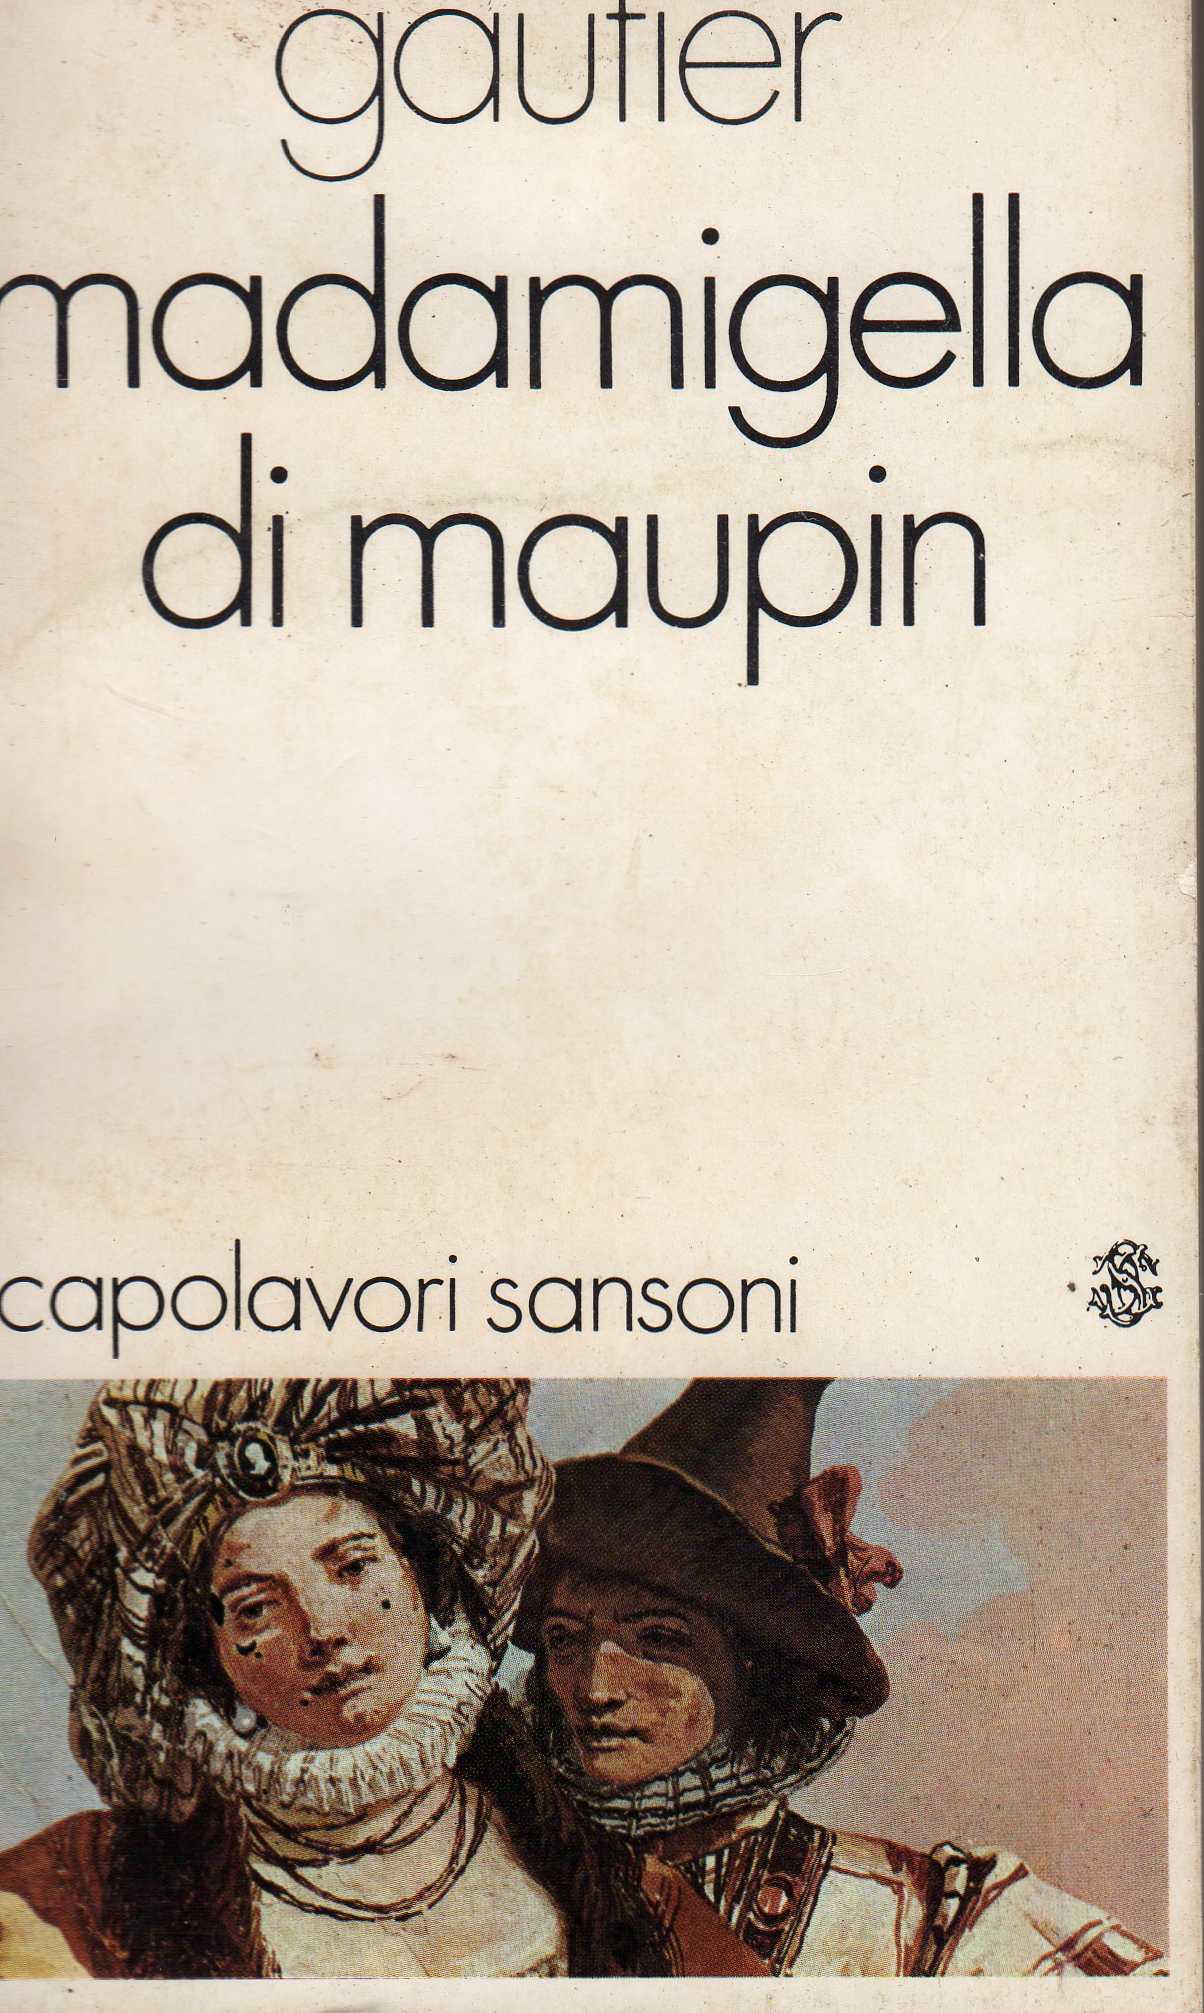 madamigella di Maupin